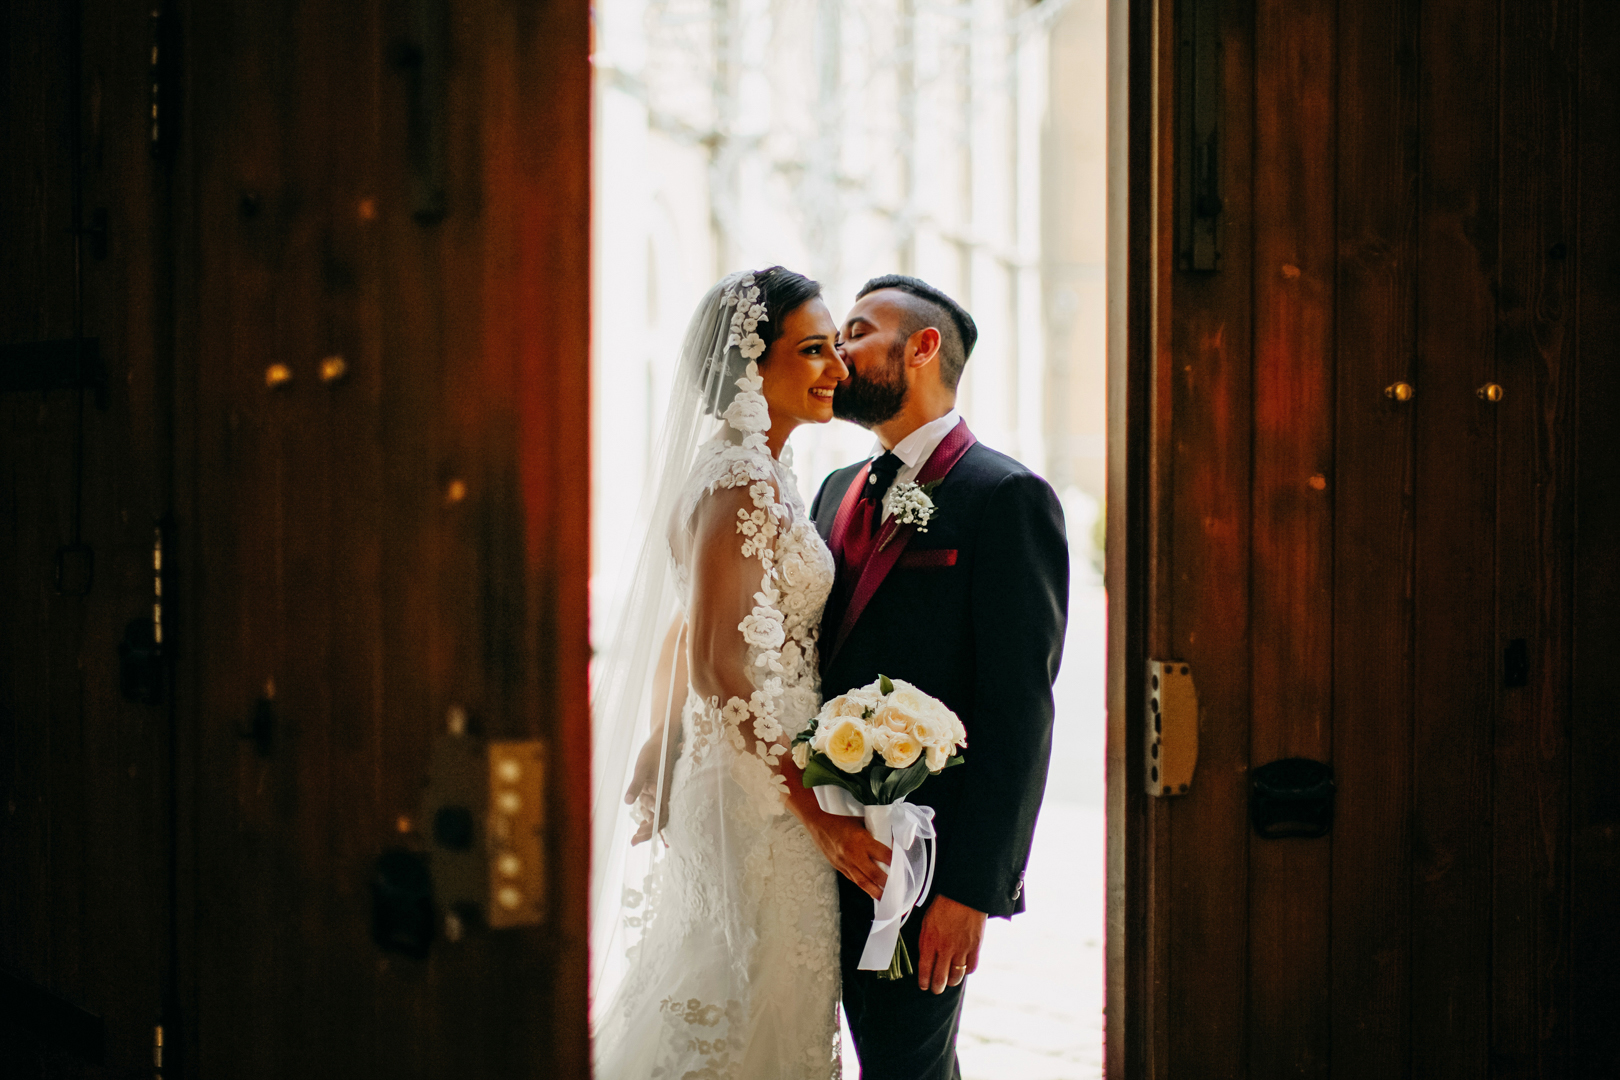 43 gianni-lepore-palazzo-vescovile-lucera-piazza-duomo-weddingitaly-matrimonio